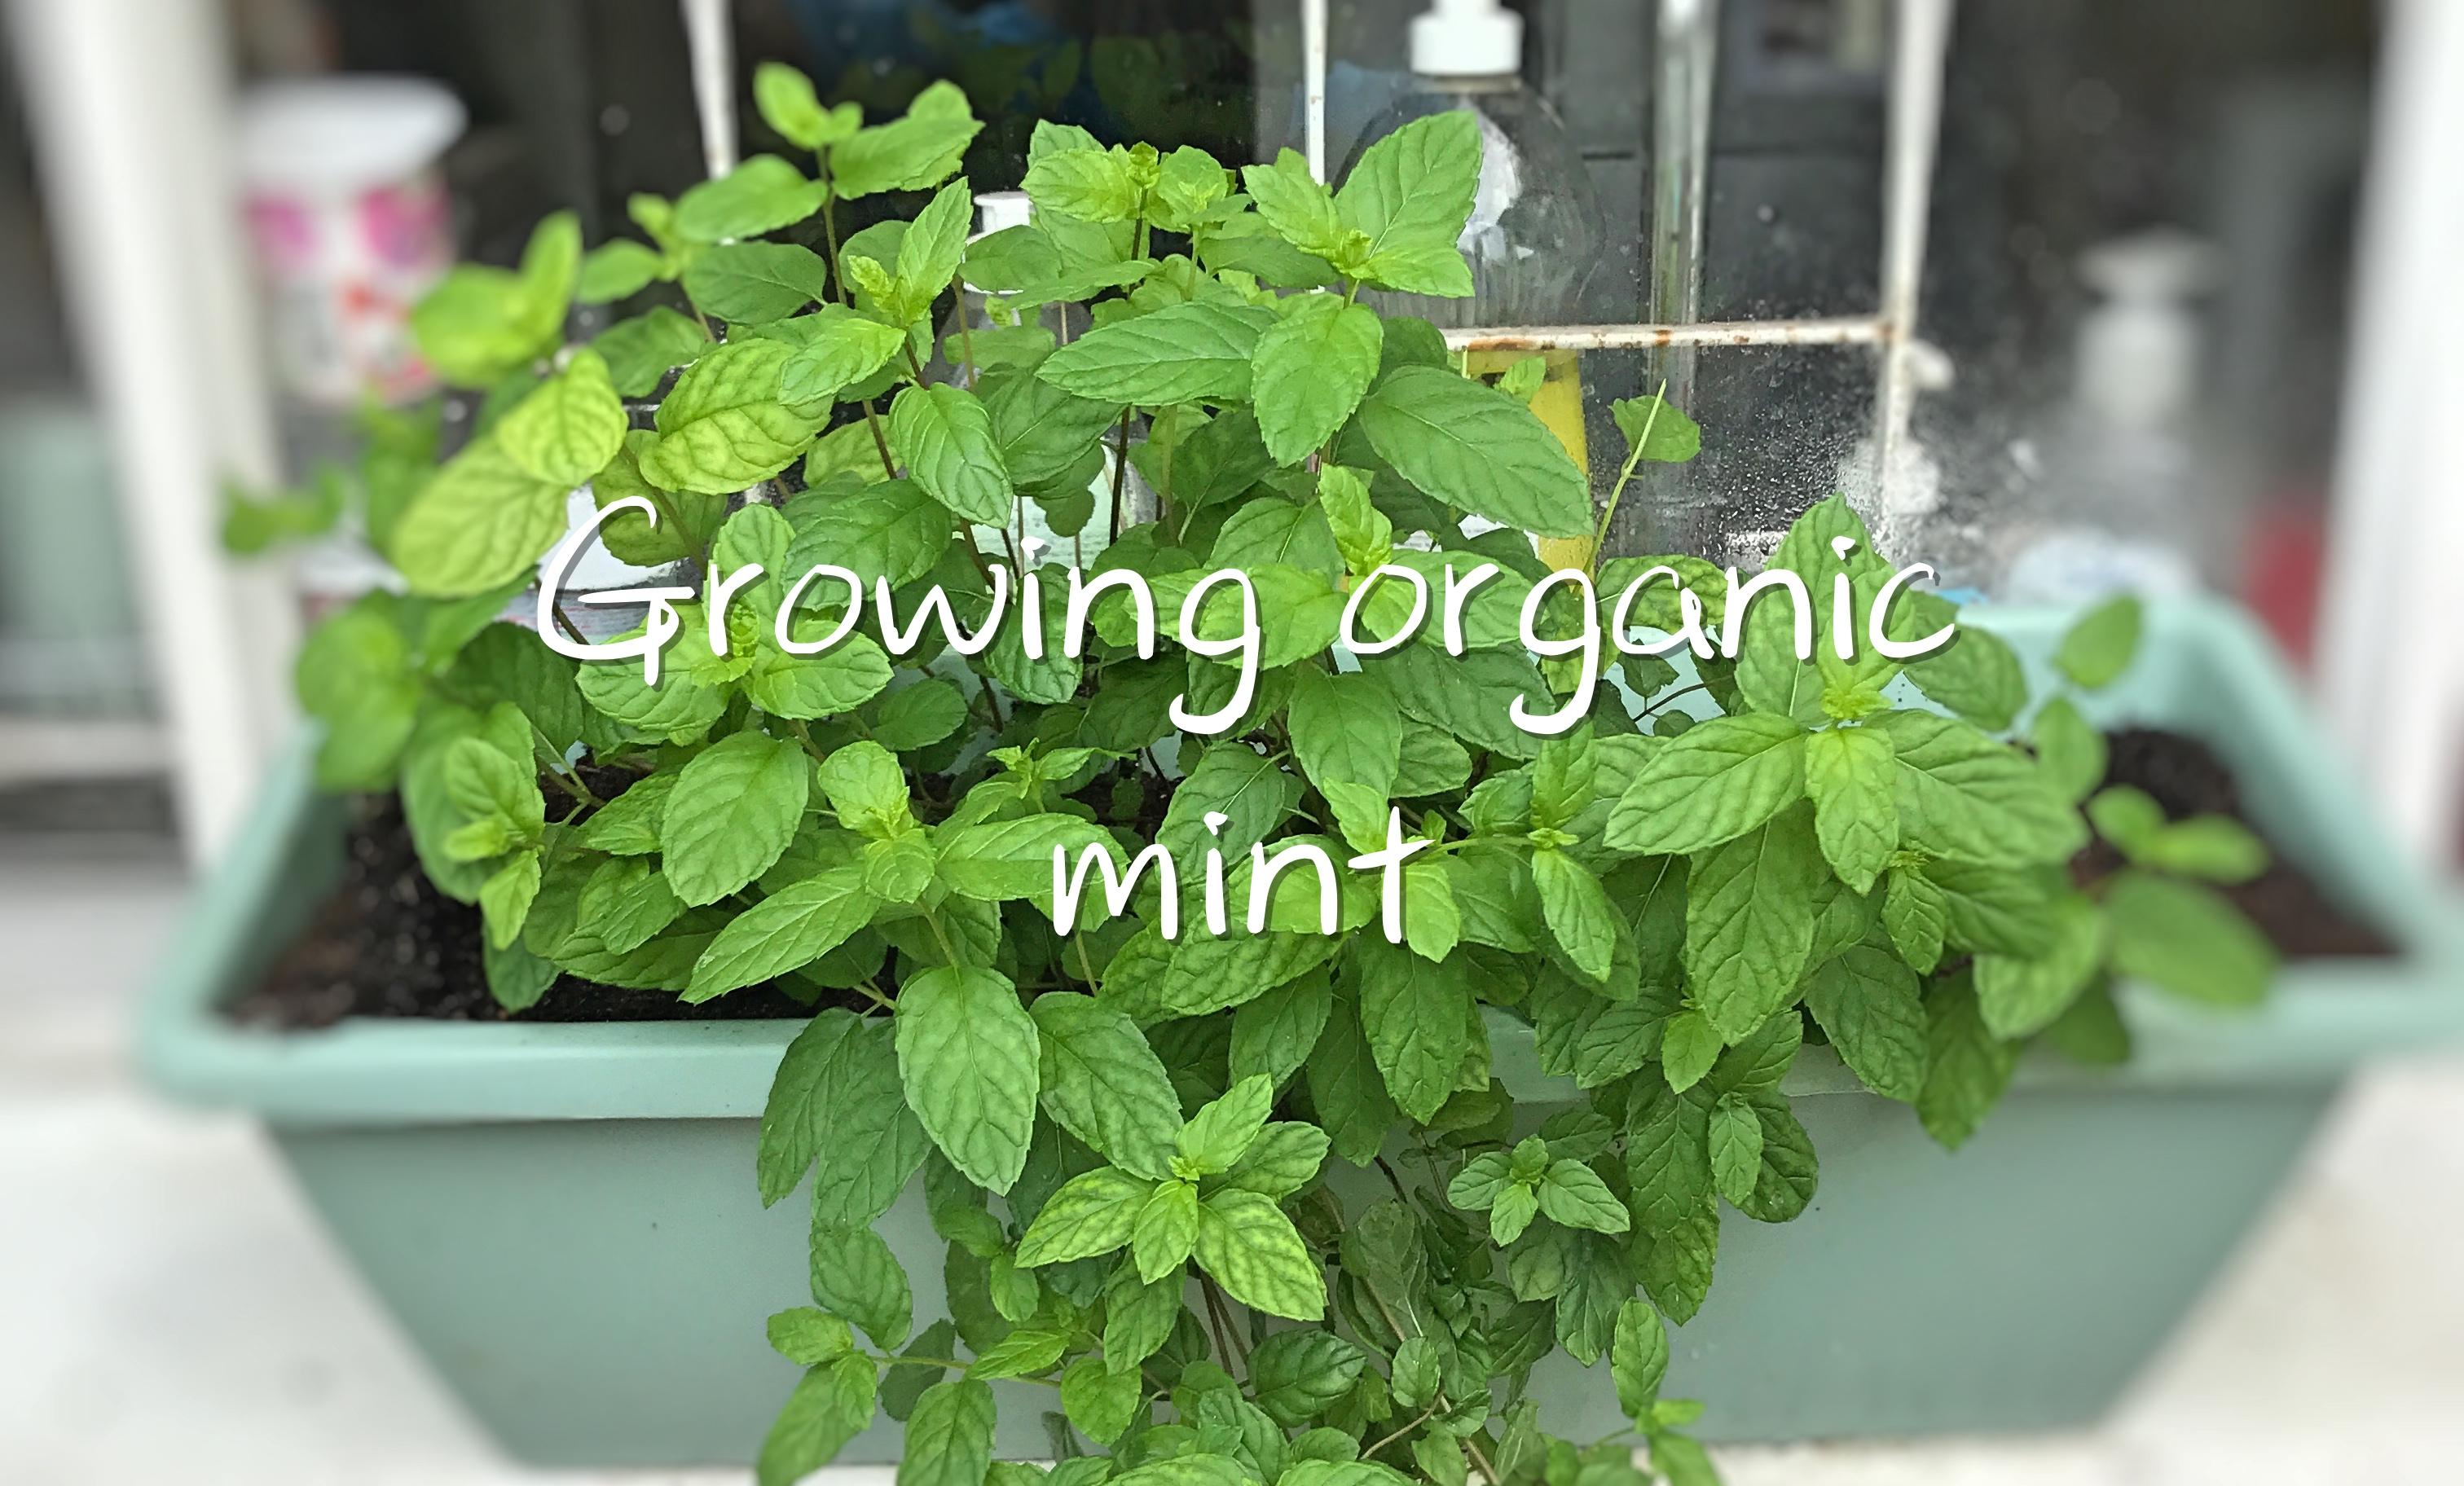 Growing organic mint